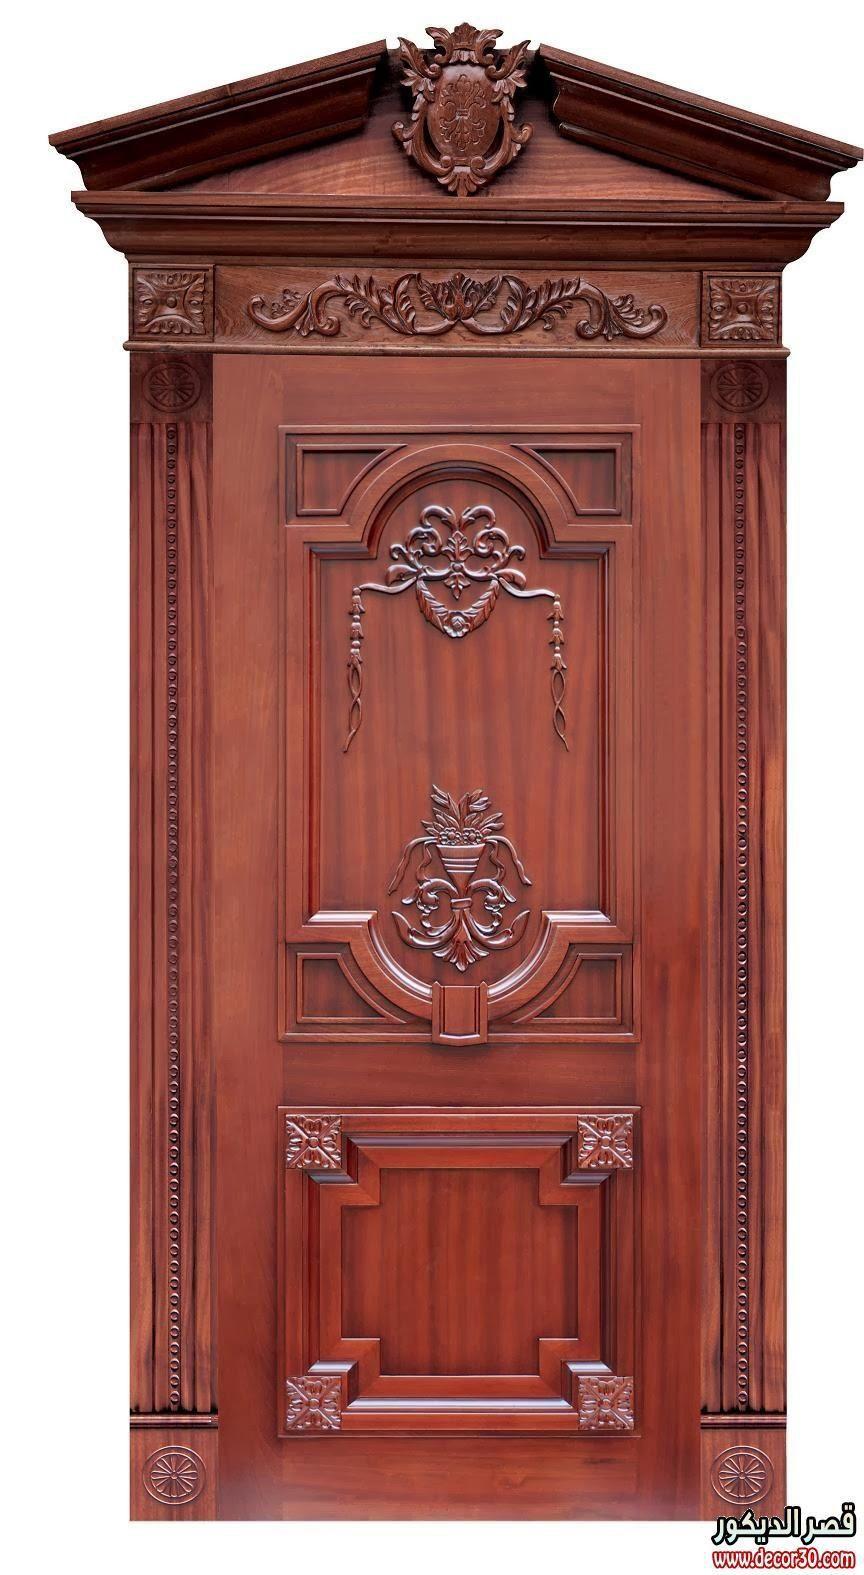 Modern Pooja Doors Google Search: Pin By Ramesh On Pooja Rooms